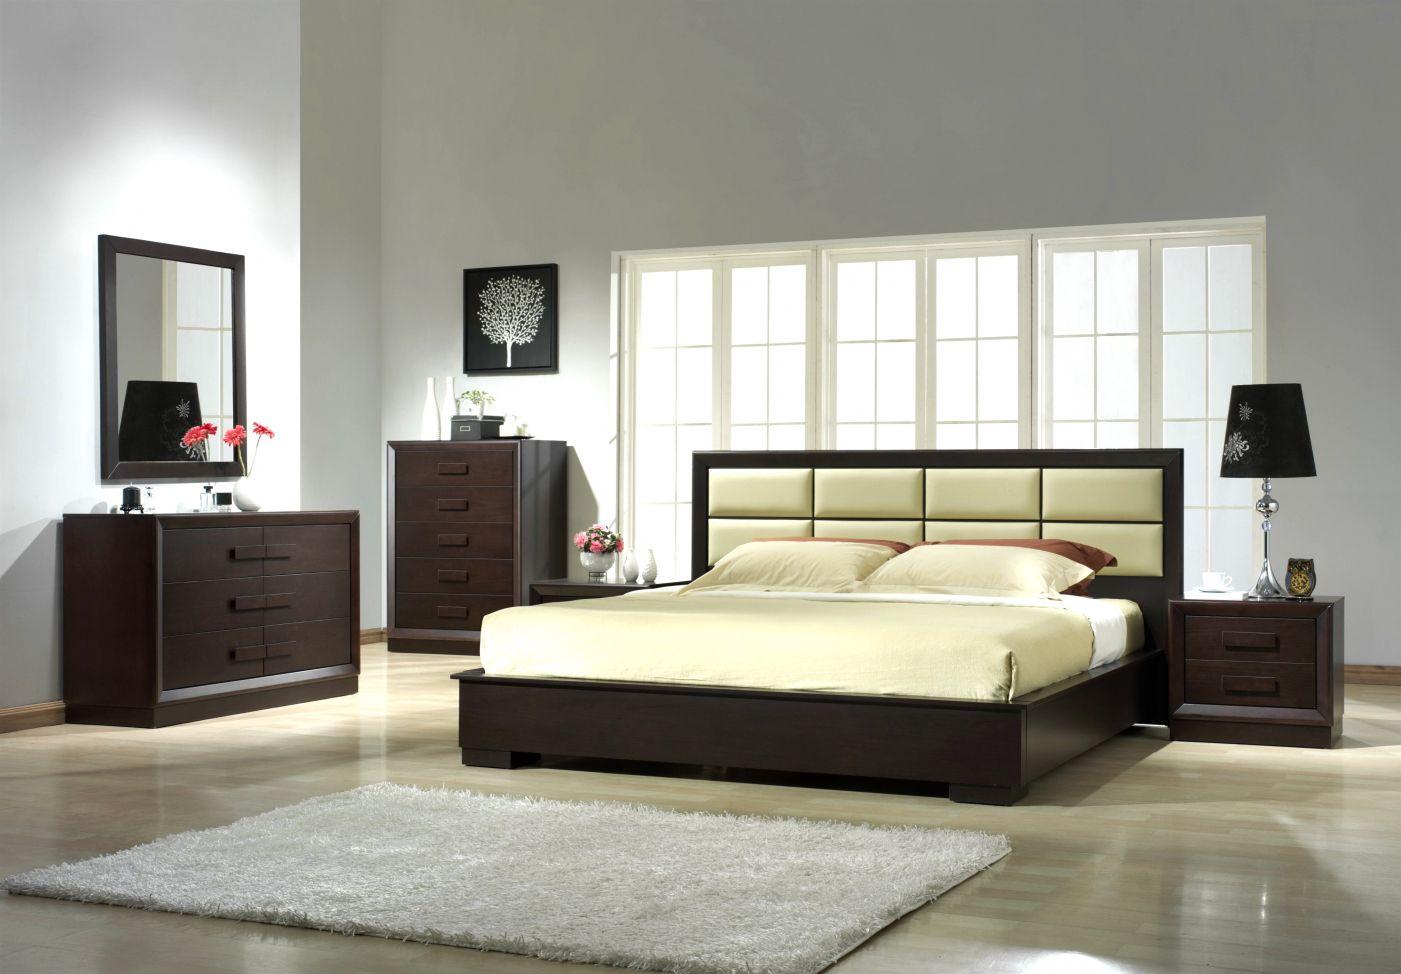 El Dorado Baby Furniture   Best Interior Paint Brand Check More At Http://